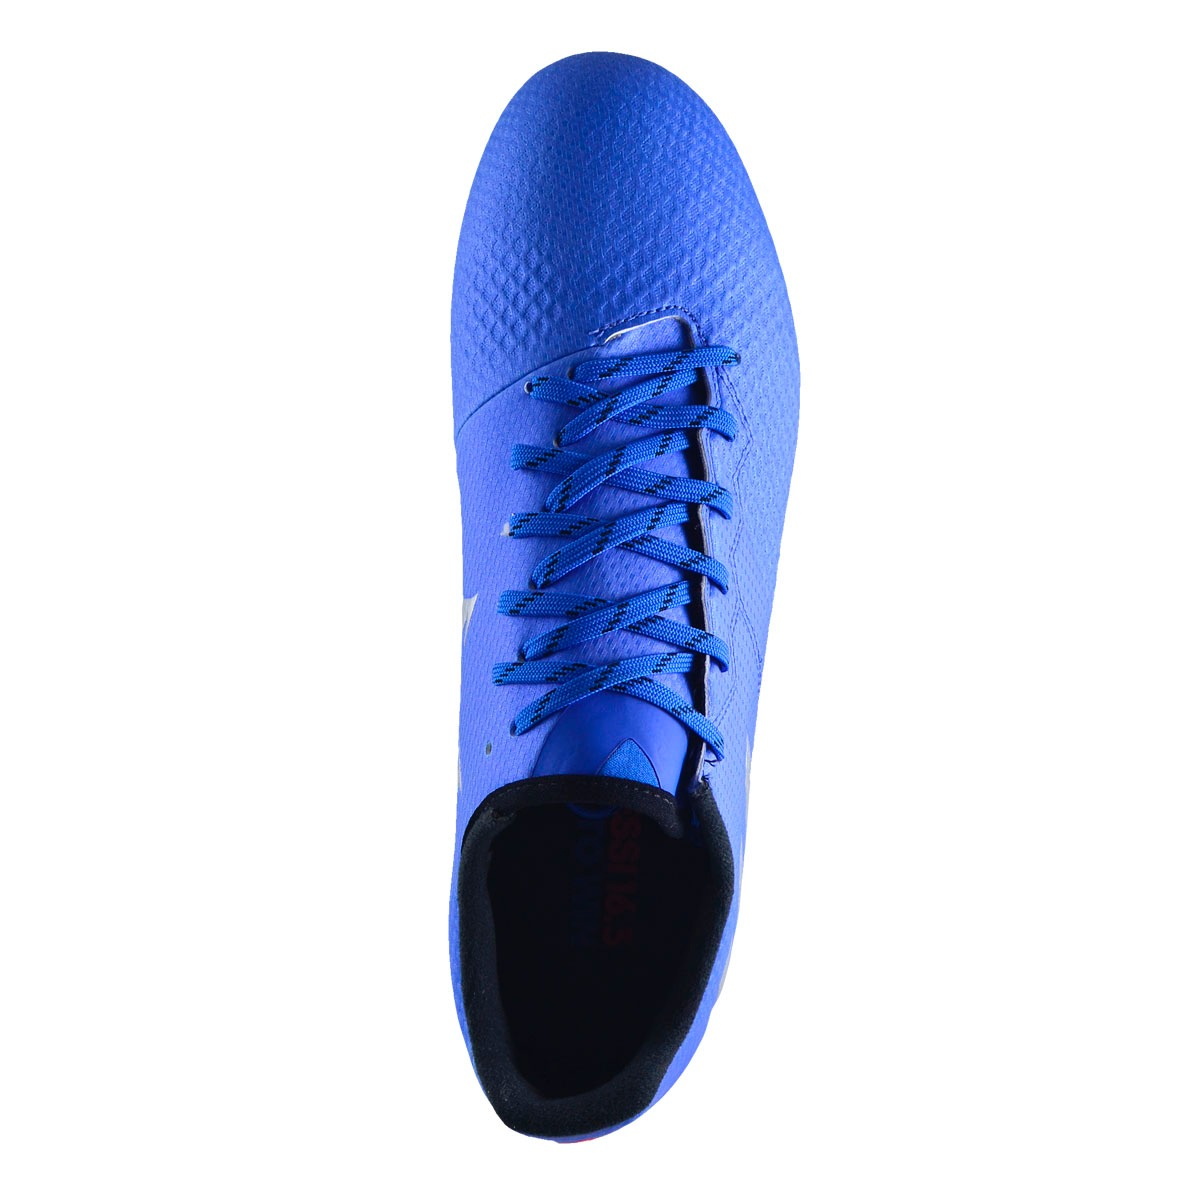 ff4b452e8fb53 botines adidas messi 16.3 suelo firme hombre azul. Cargando zoom.